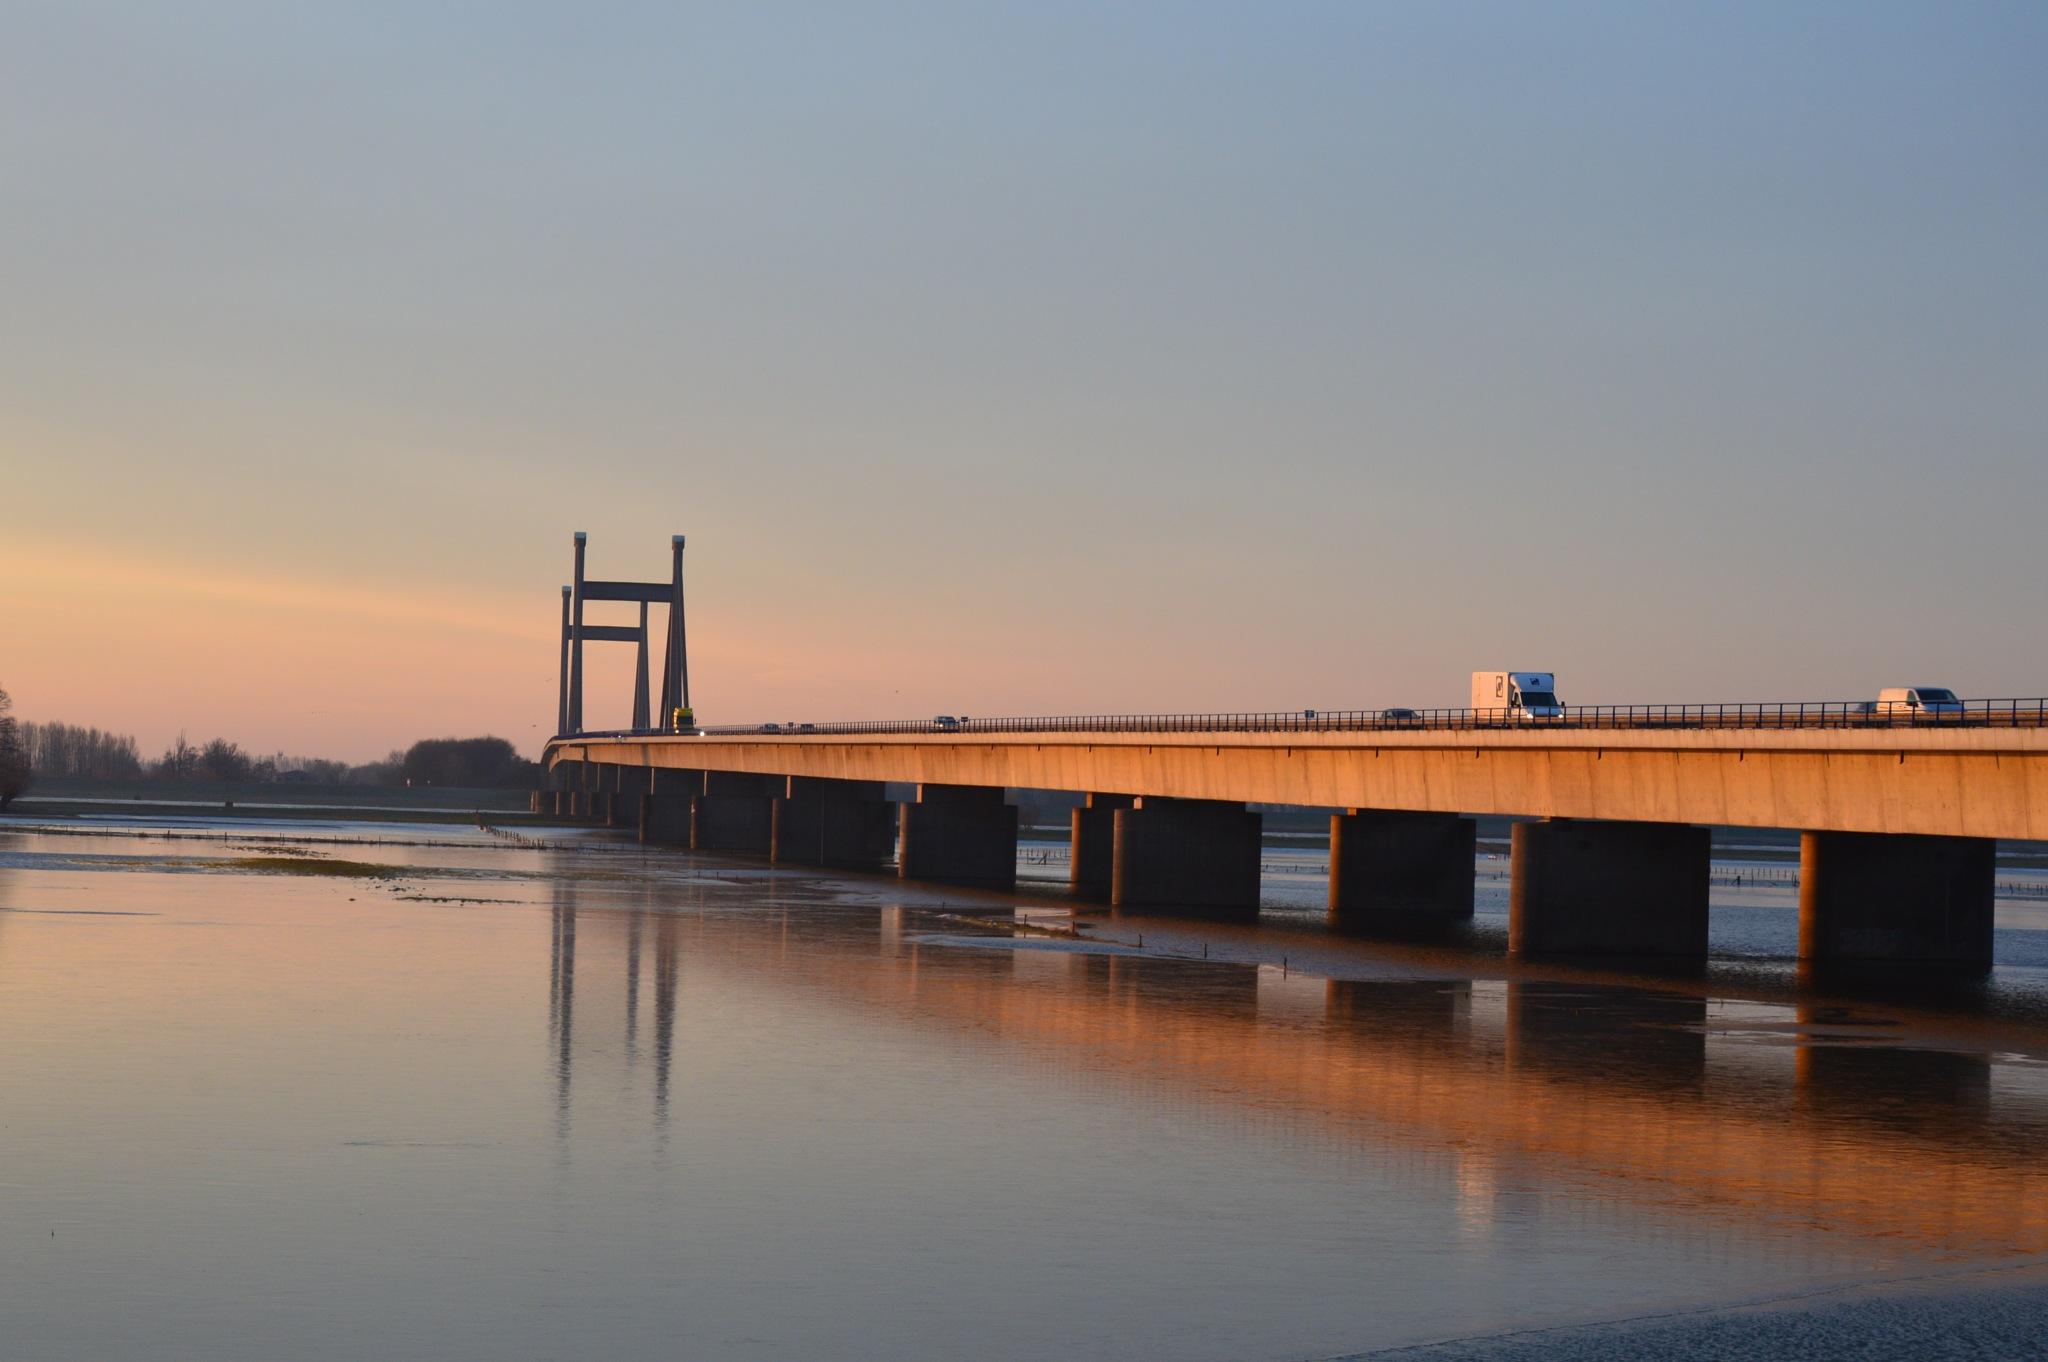 Bridge by Roanne Frerejean